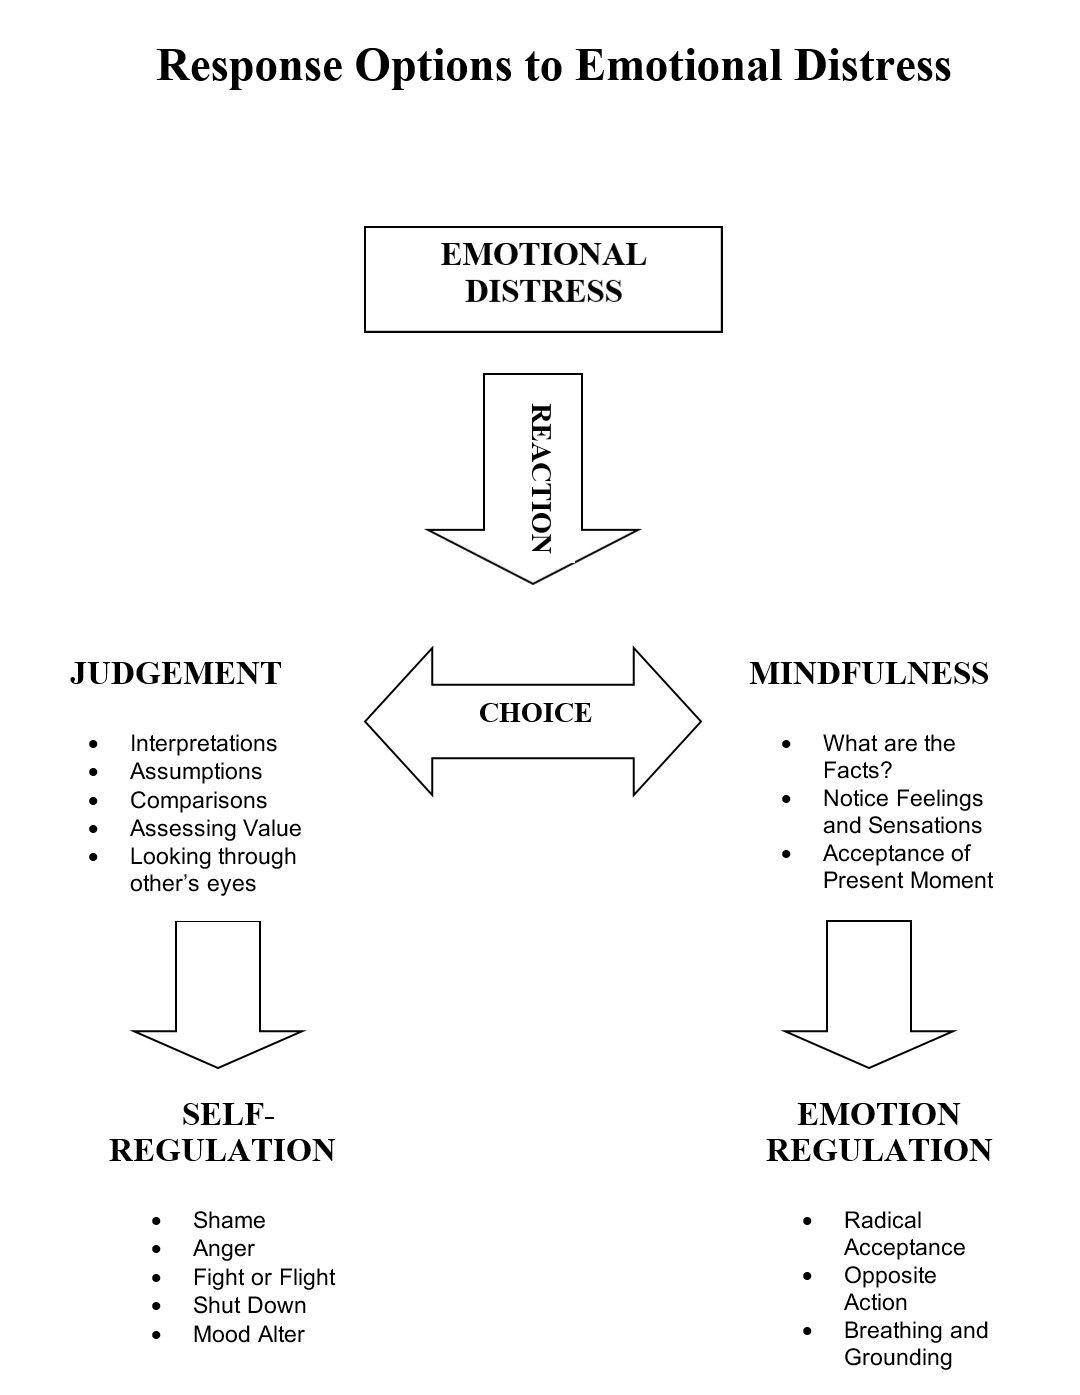 Response Options Emotional Distress